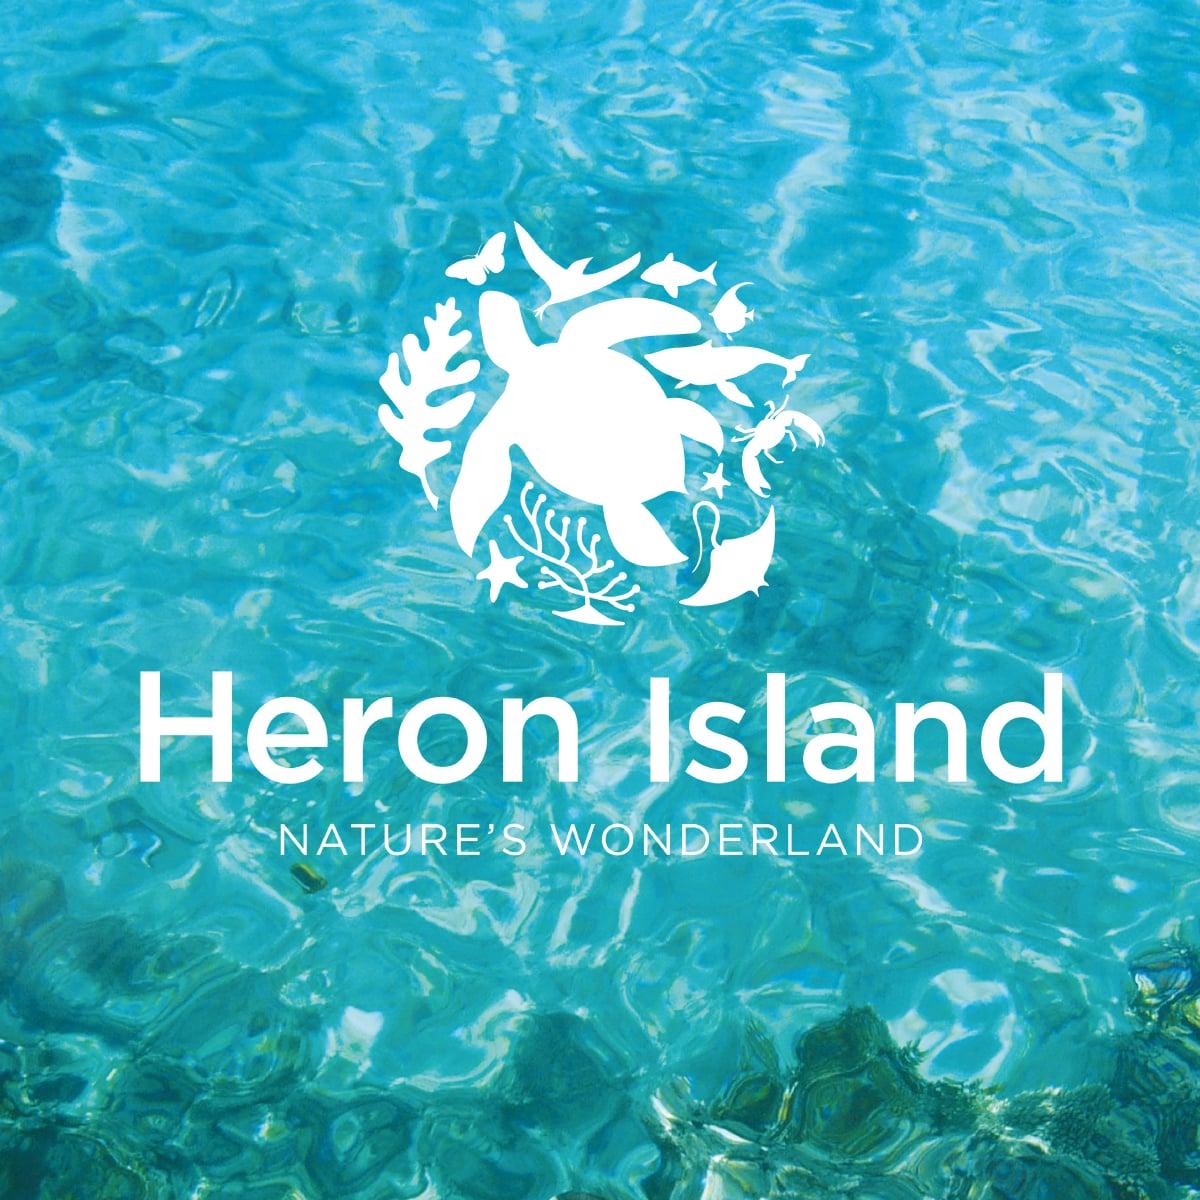 Davidson Branding Corporate Heron Island Brand Identity Logo Design Nature Wonderland Water Wildlife